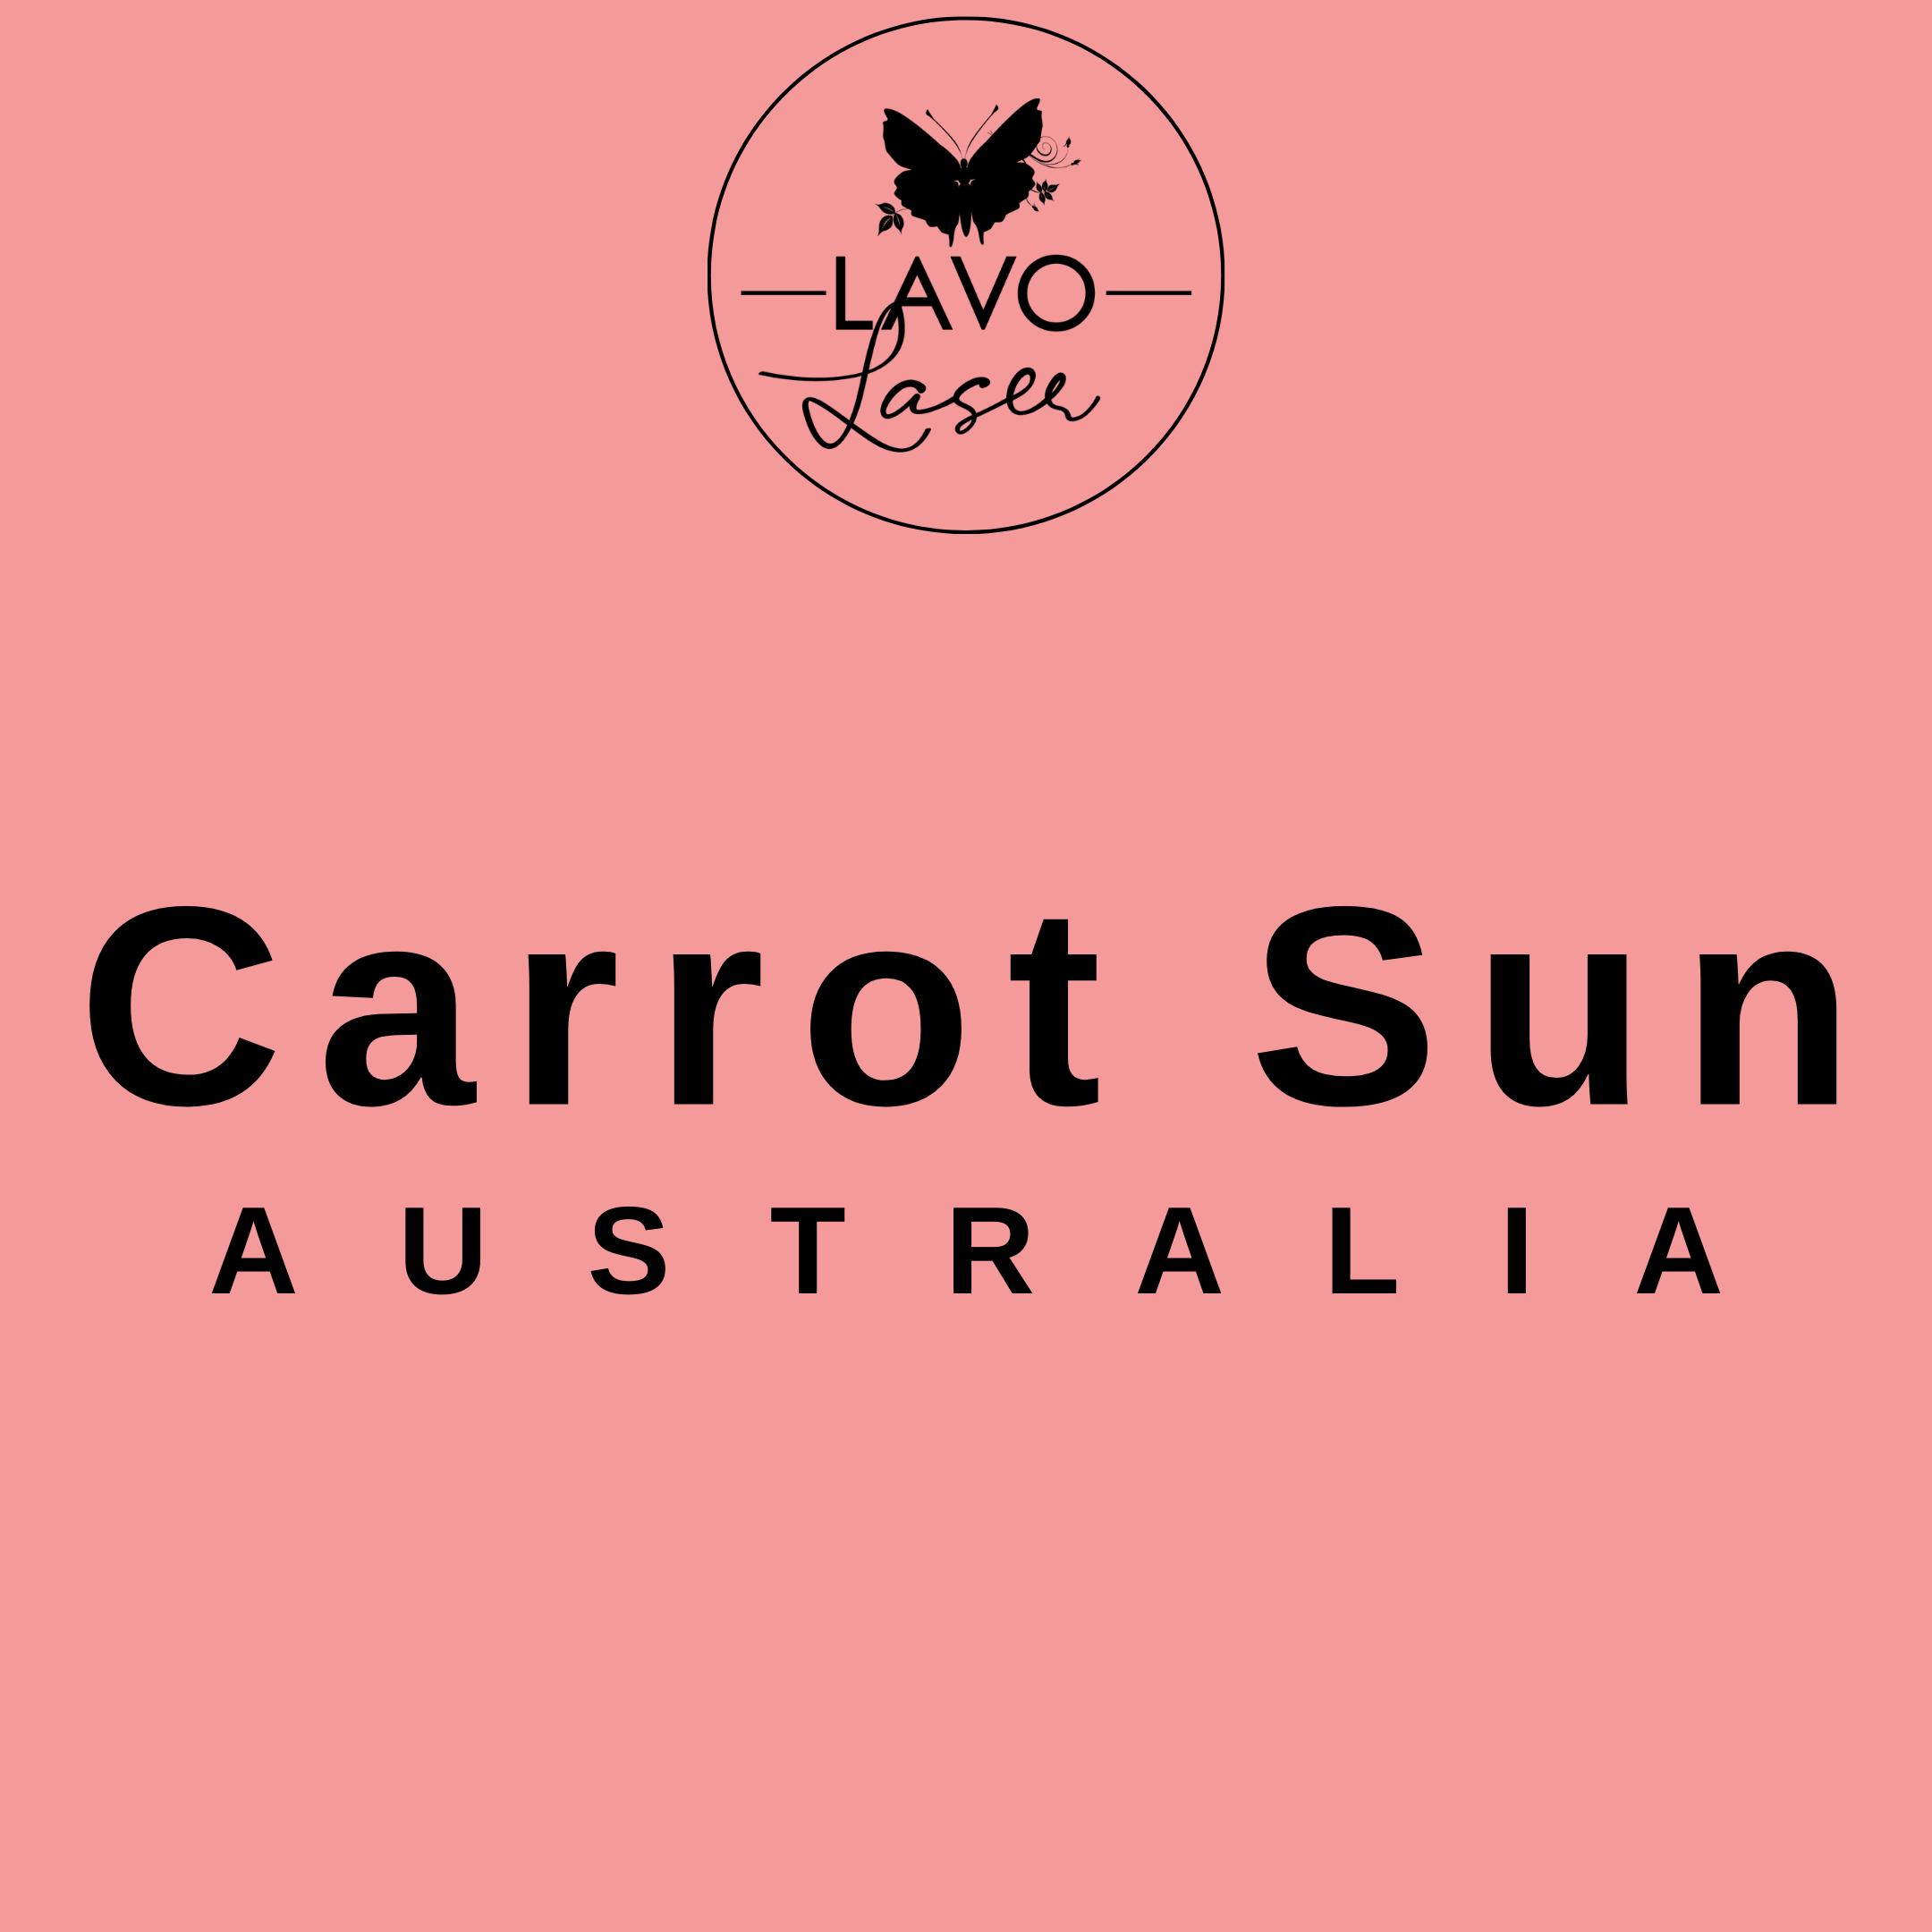 CARROT SUN